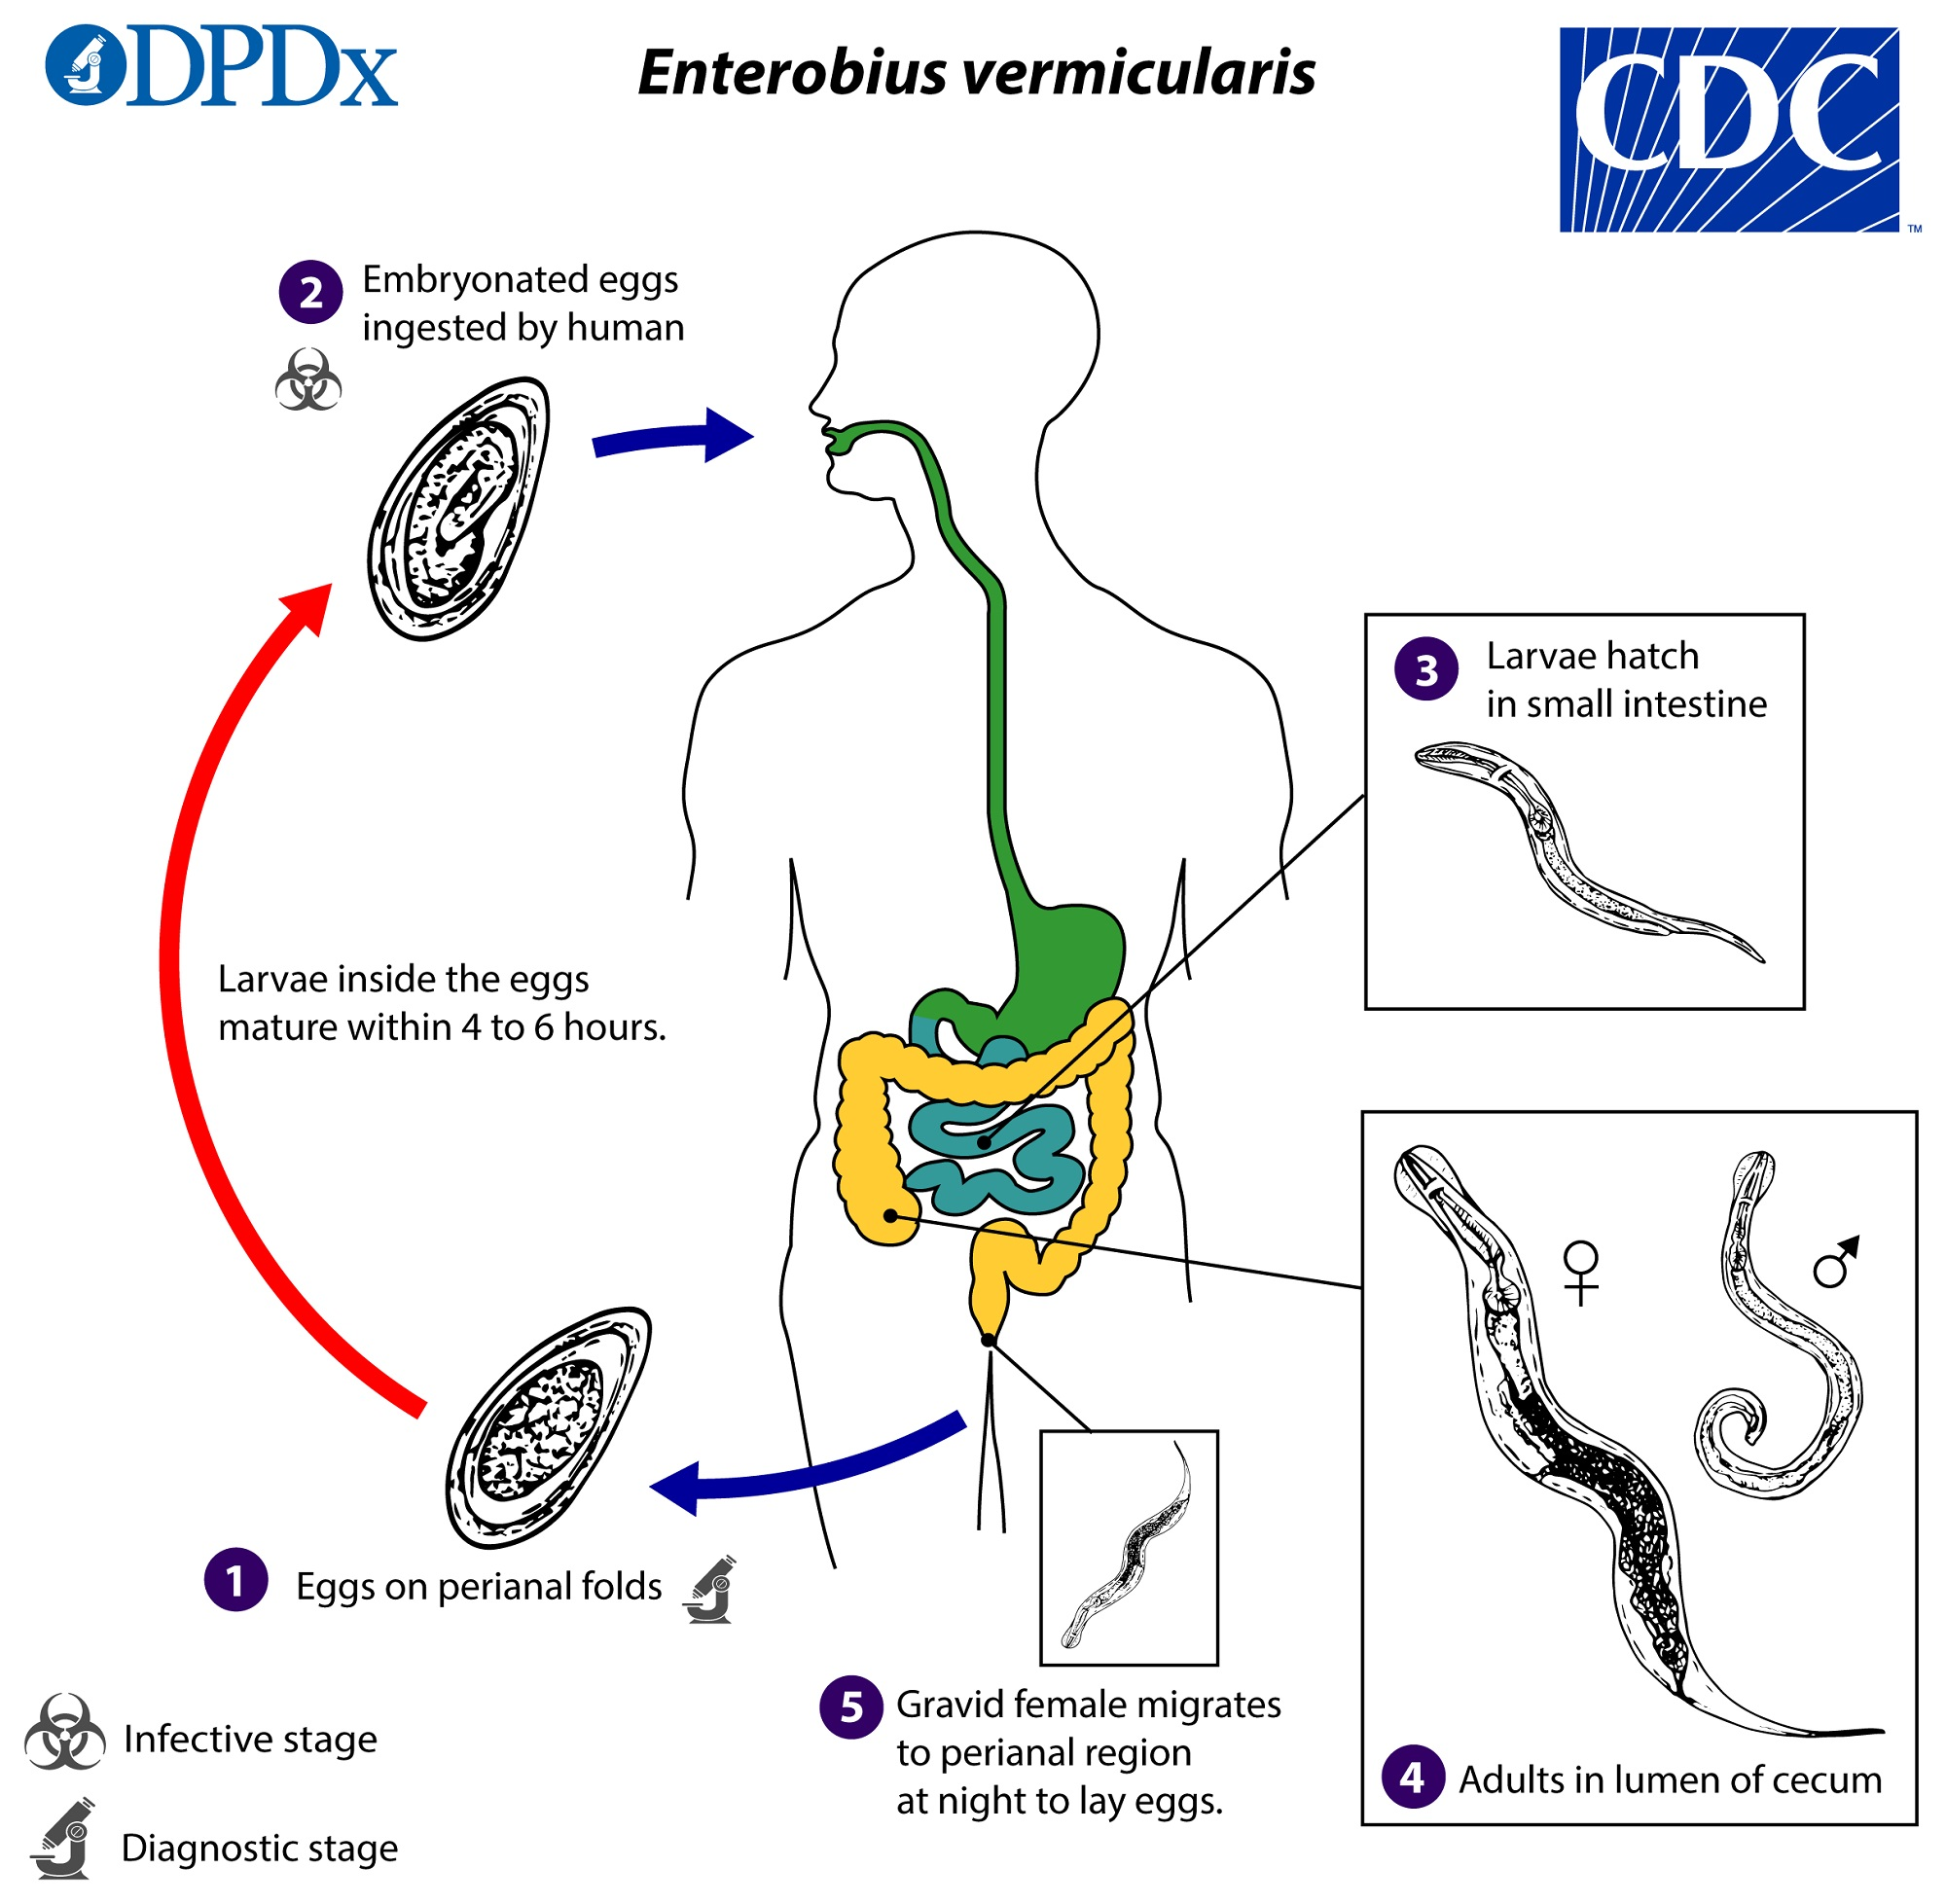 enterobius vermicularis k l kurd fertőzés